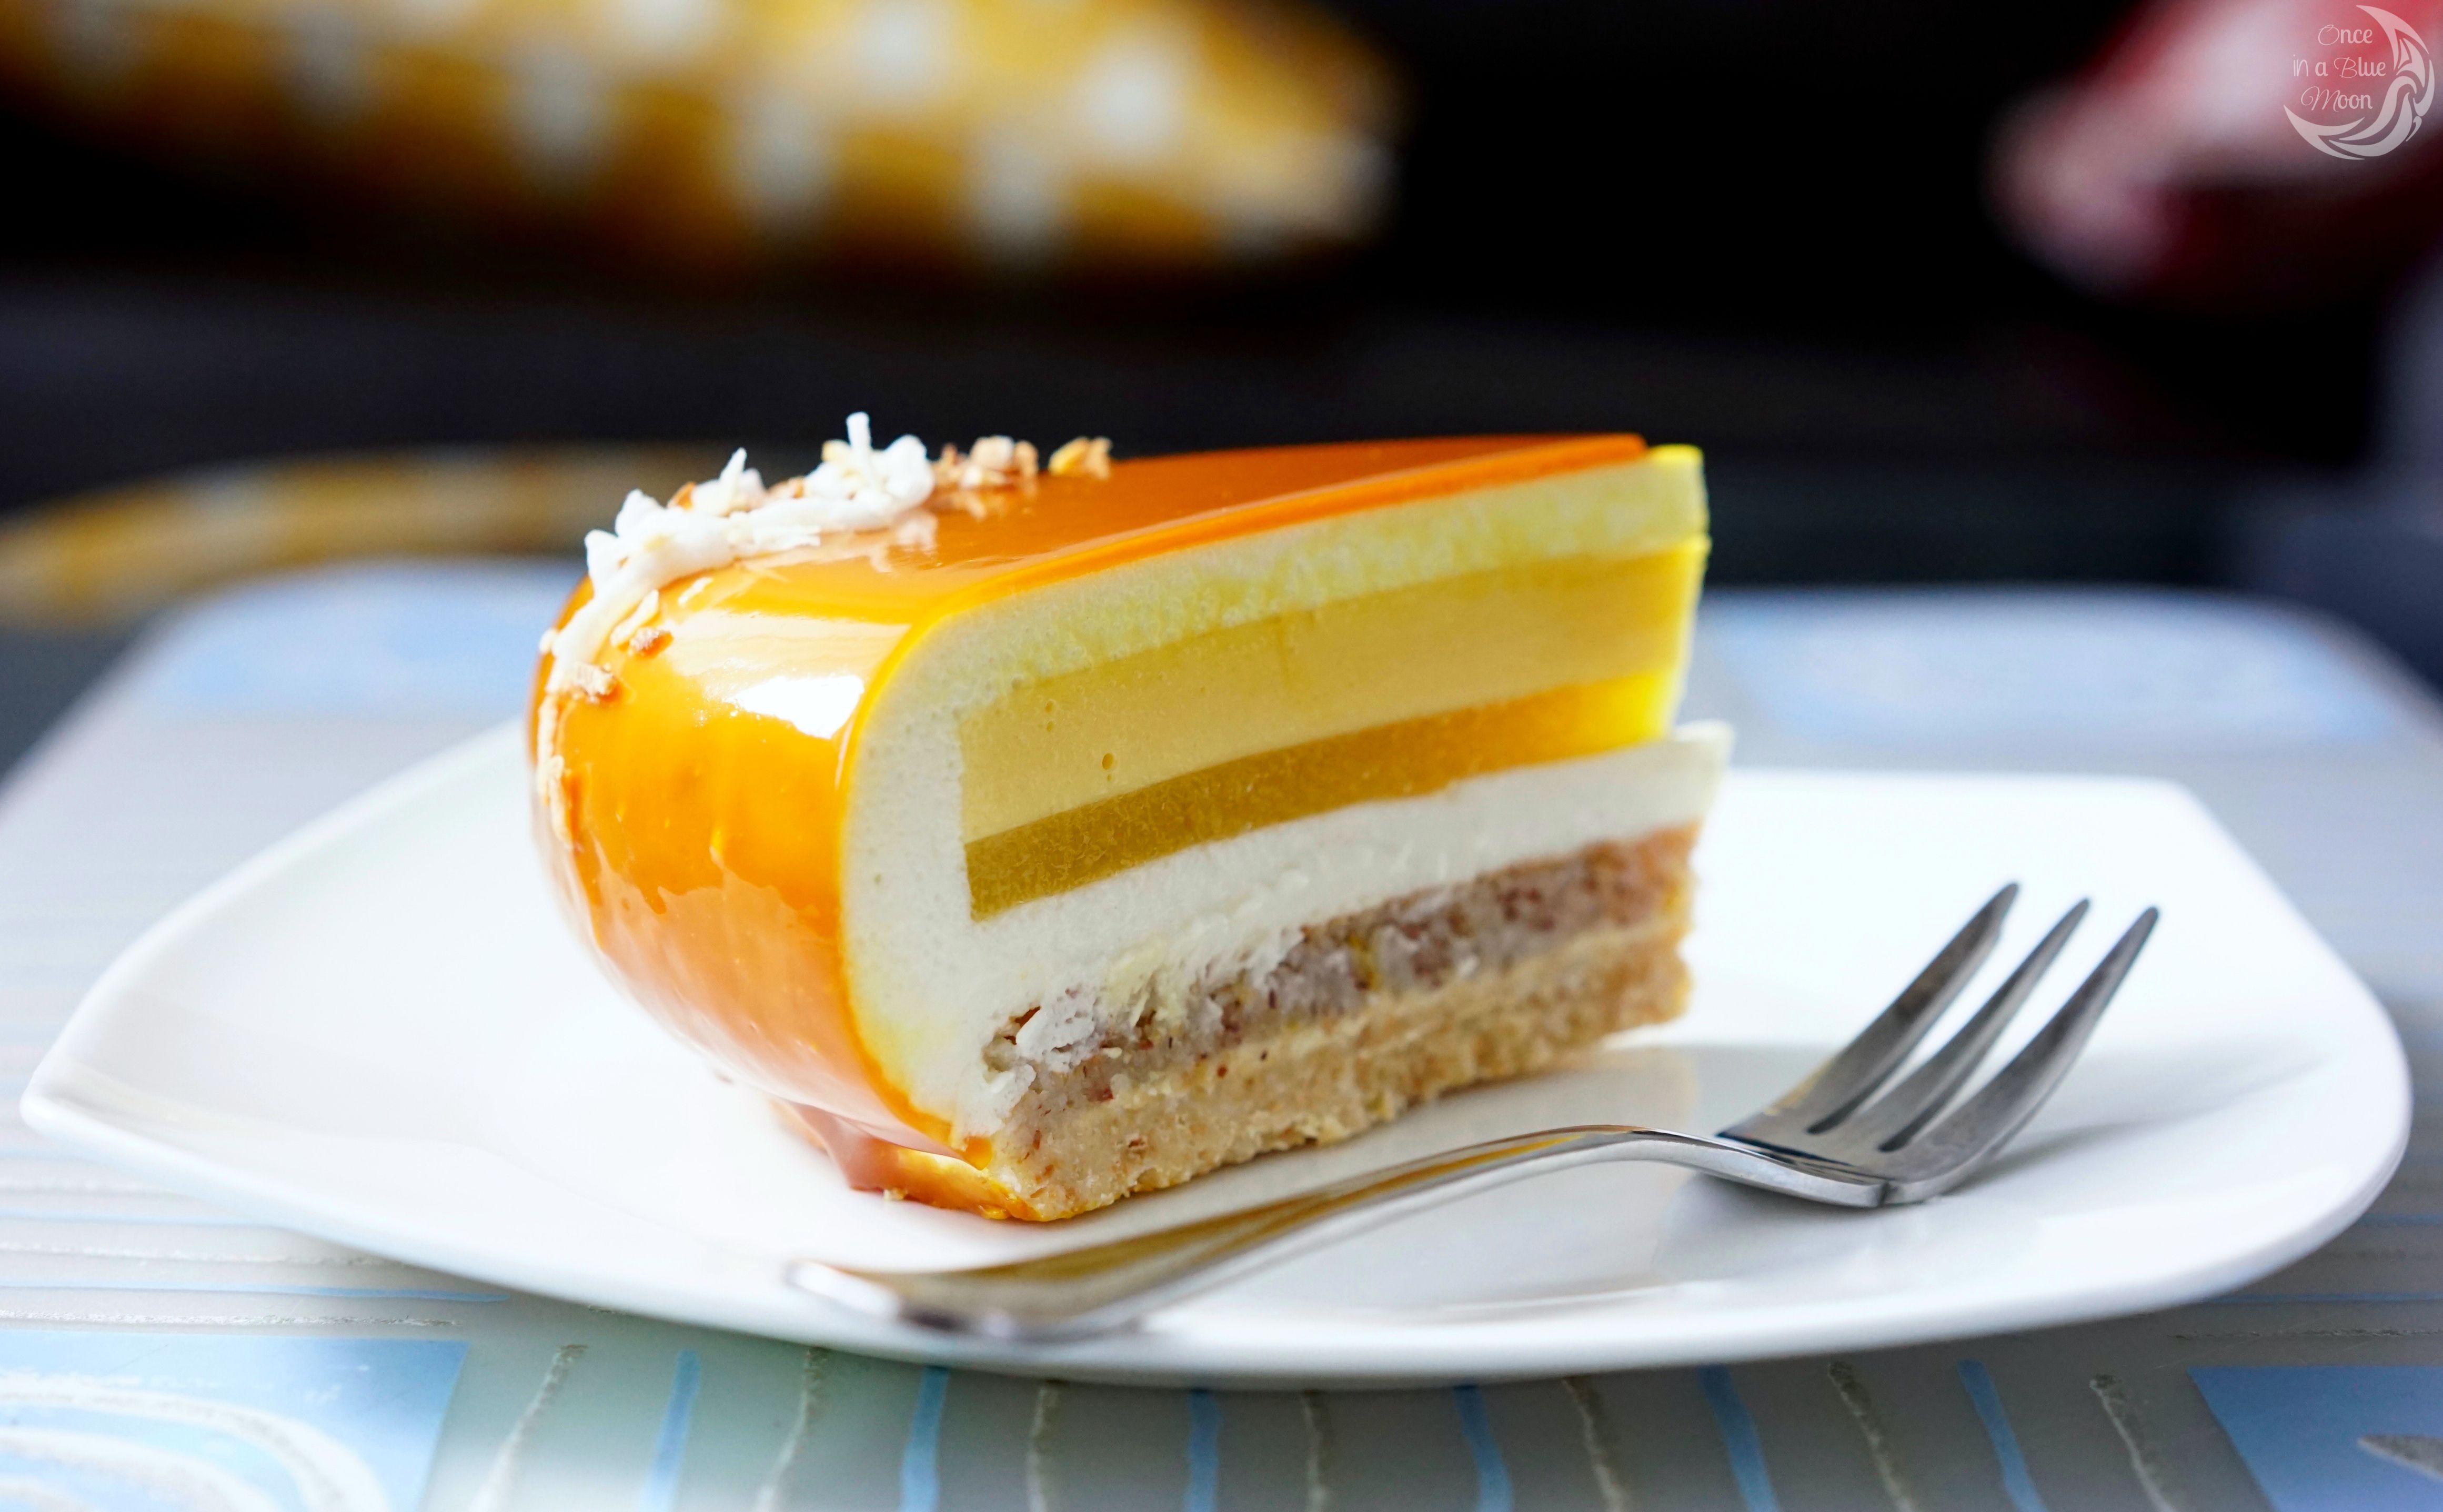 Caramel Flavoured Cake Recipe